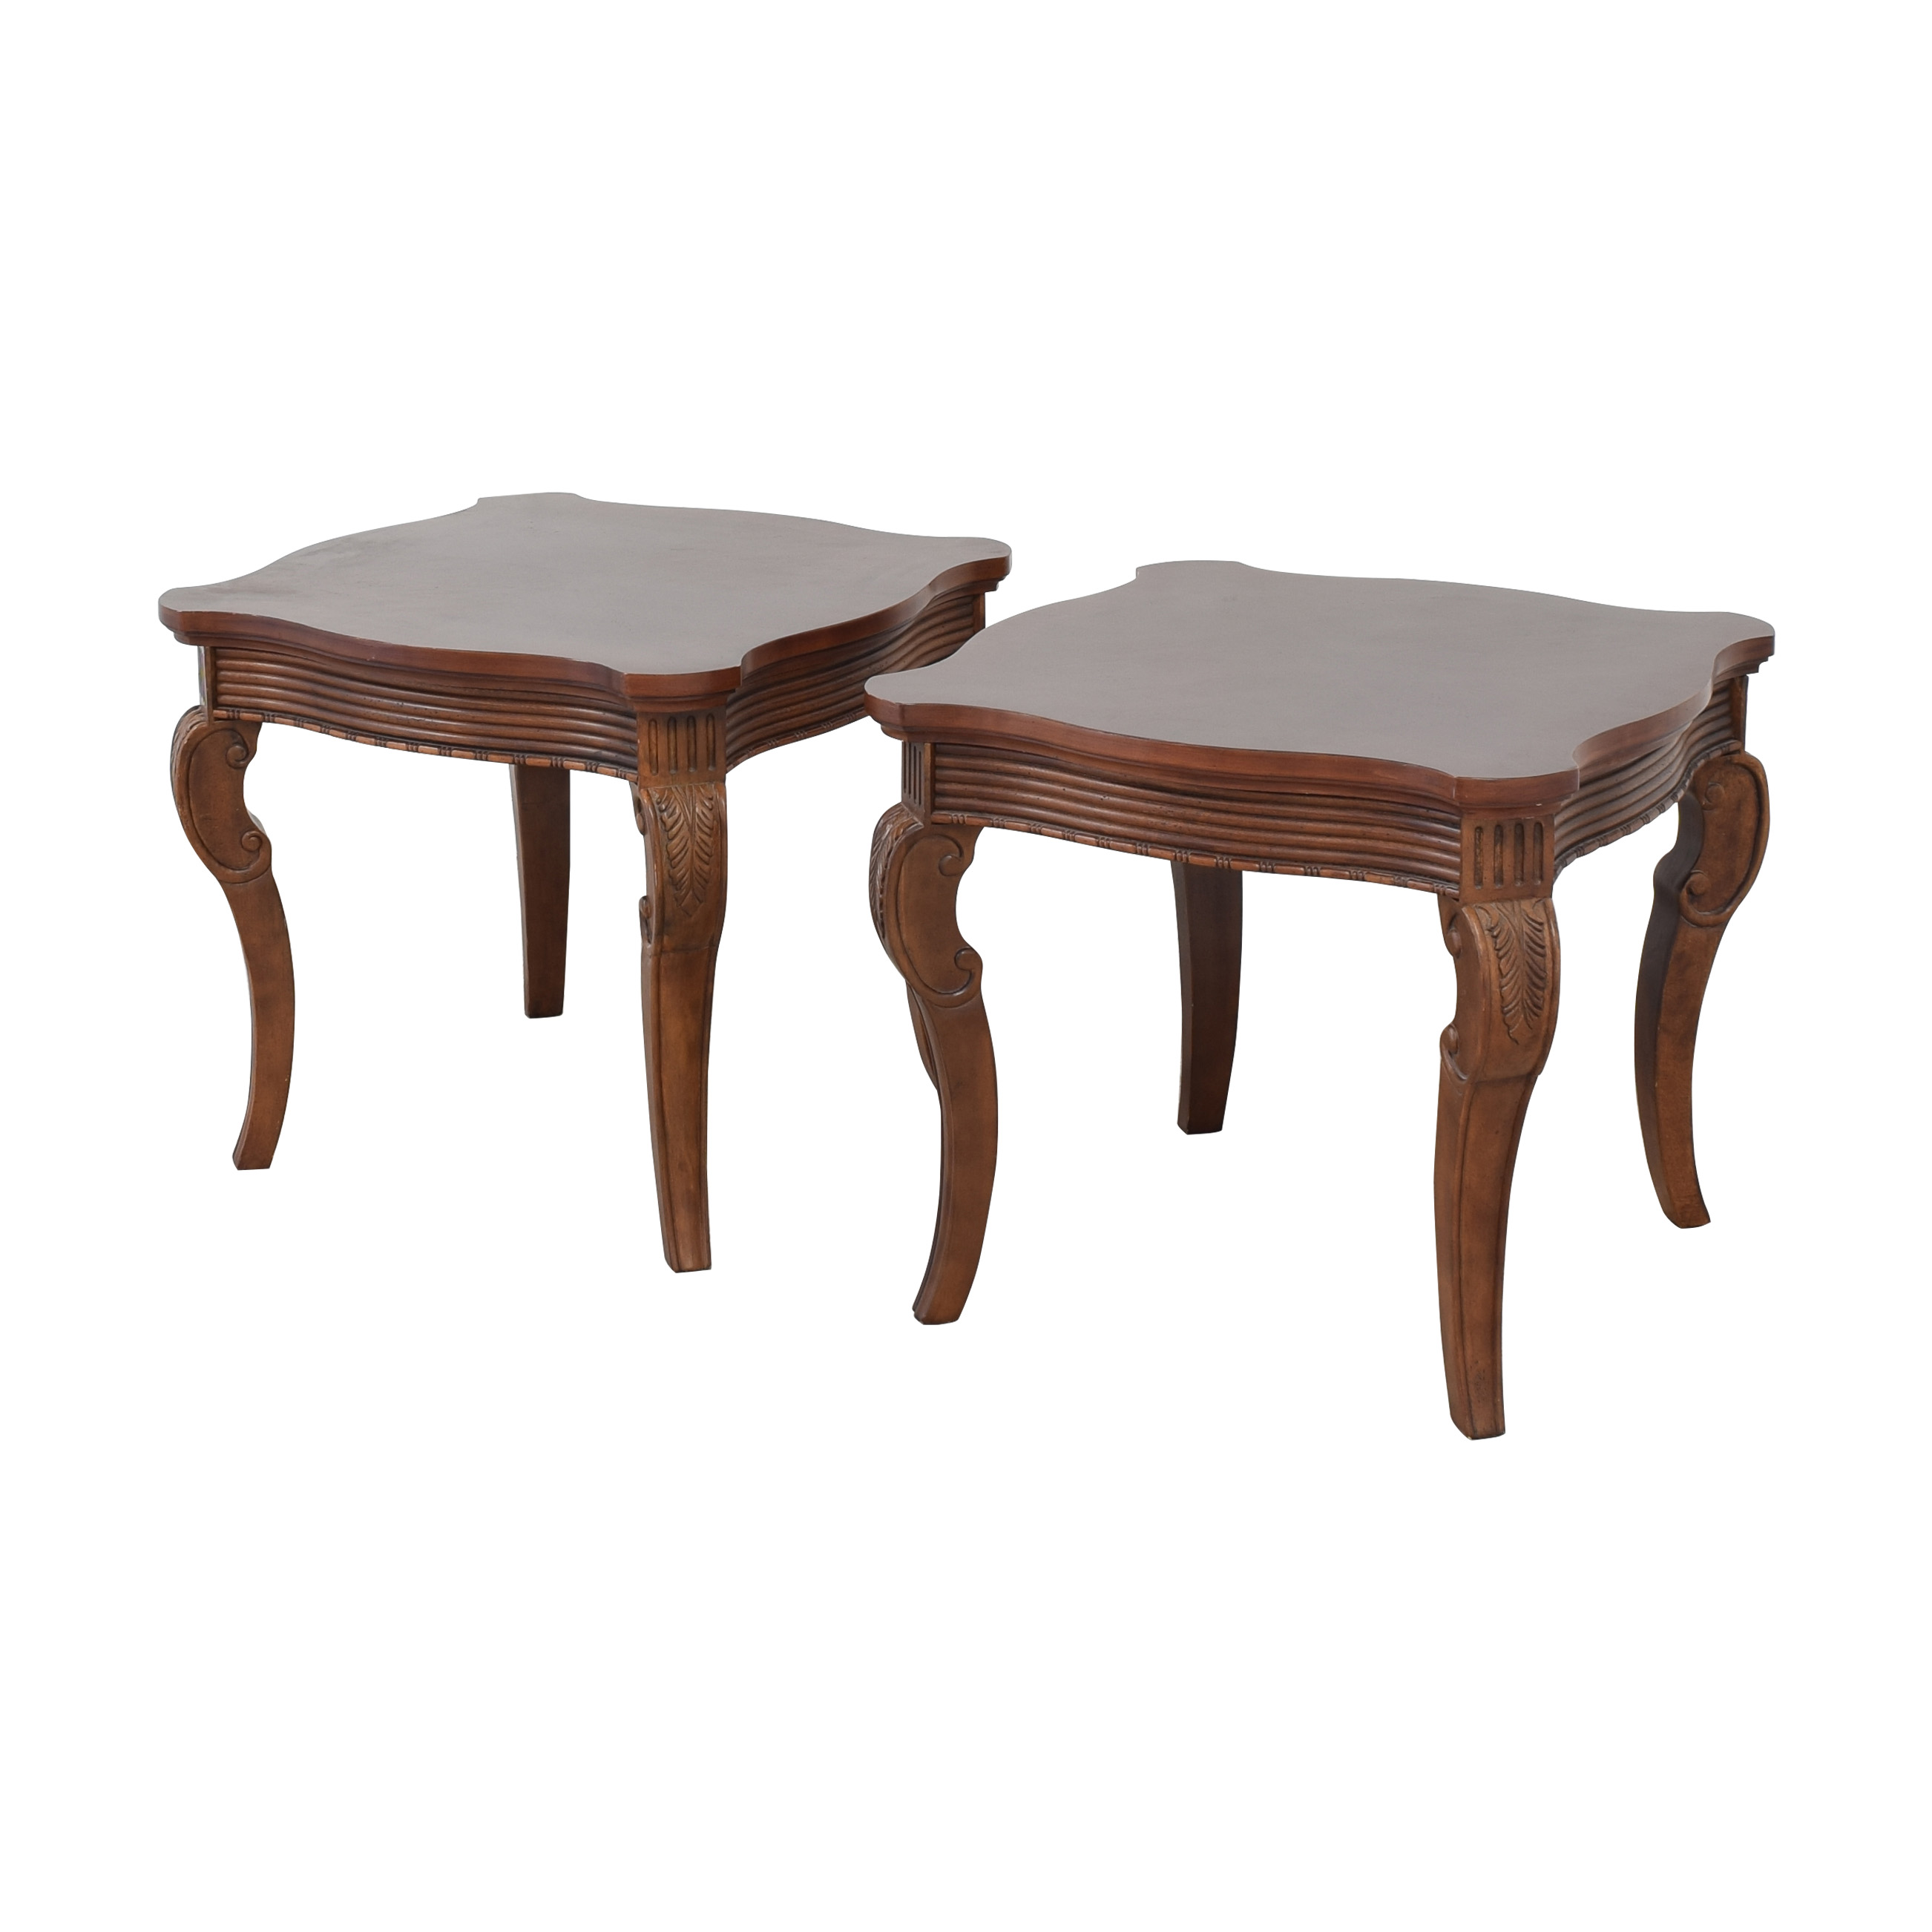 Bernhardt Bernhardt Side Tables second hand